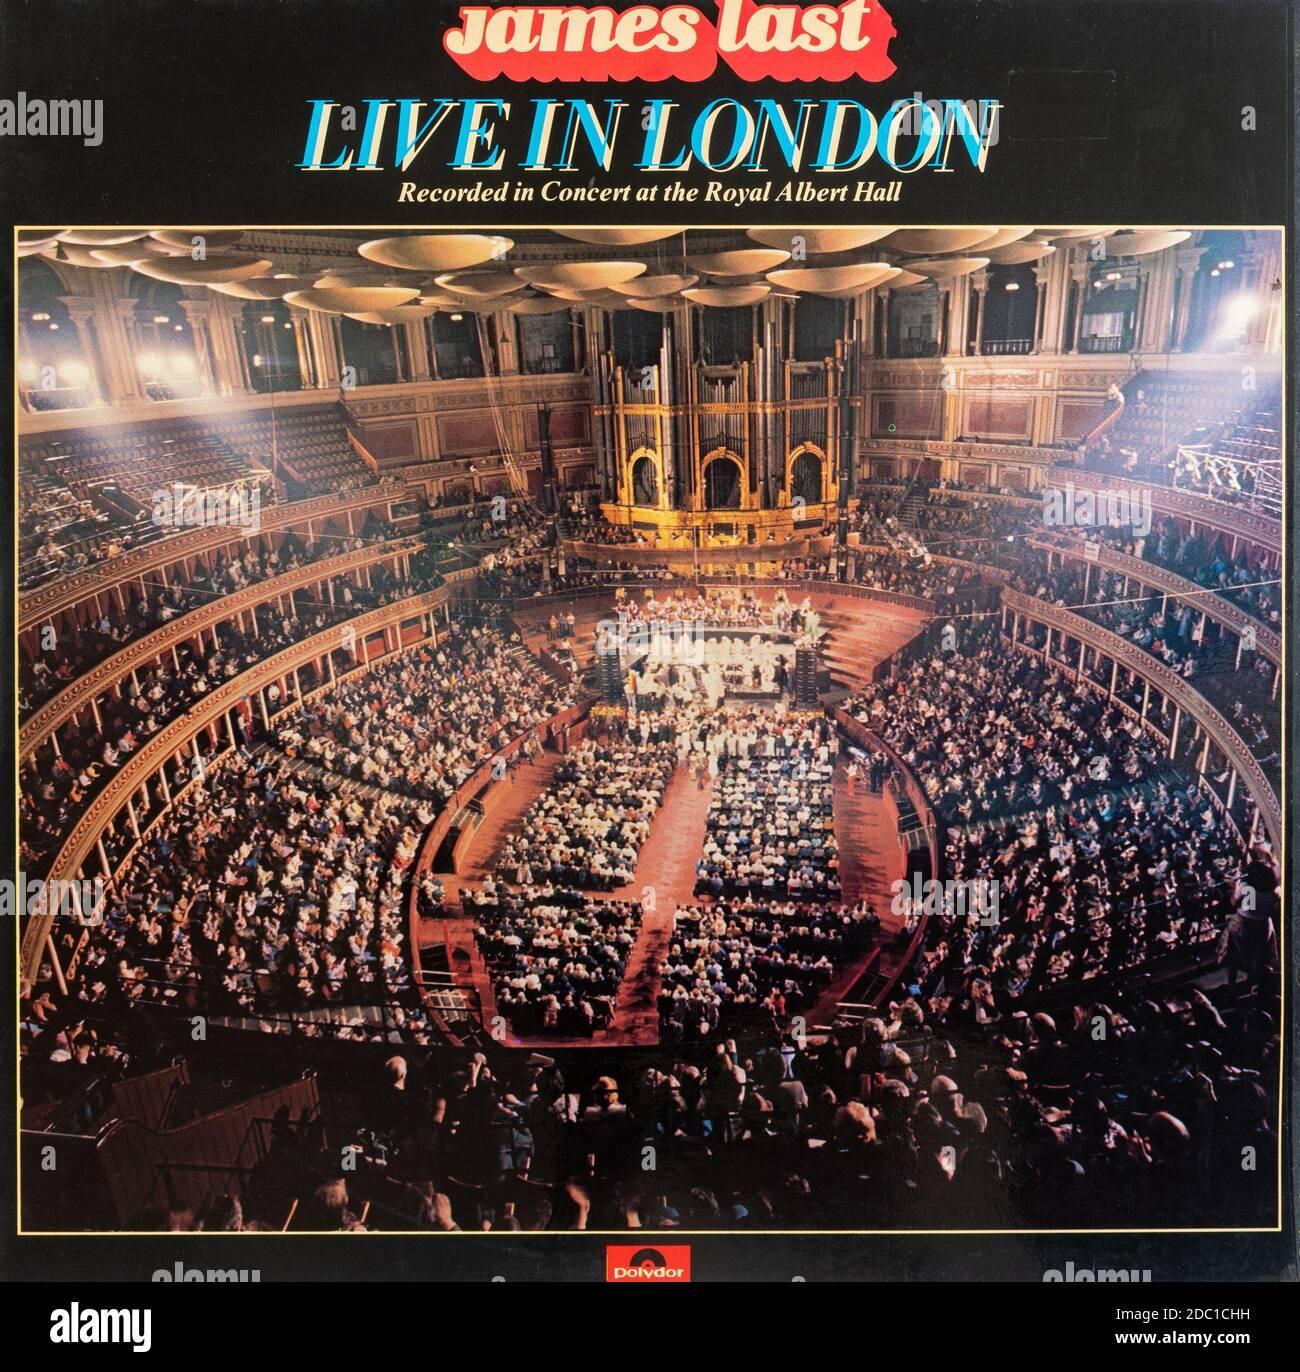 James Last Live in London, vinyl LP record album cover Stock Photo